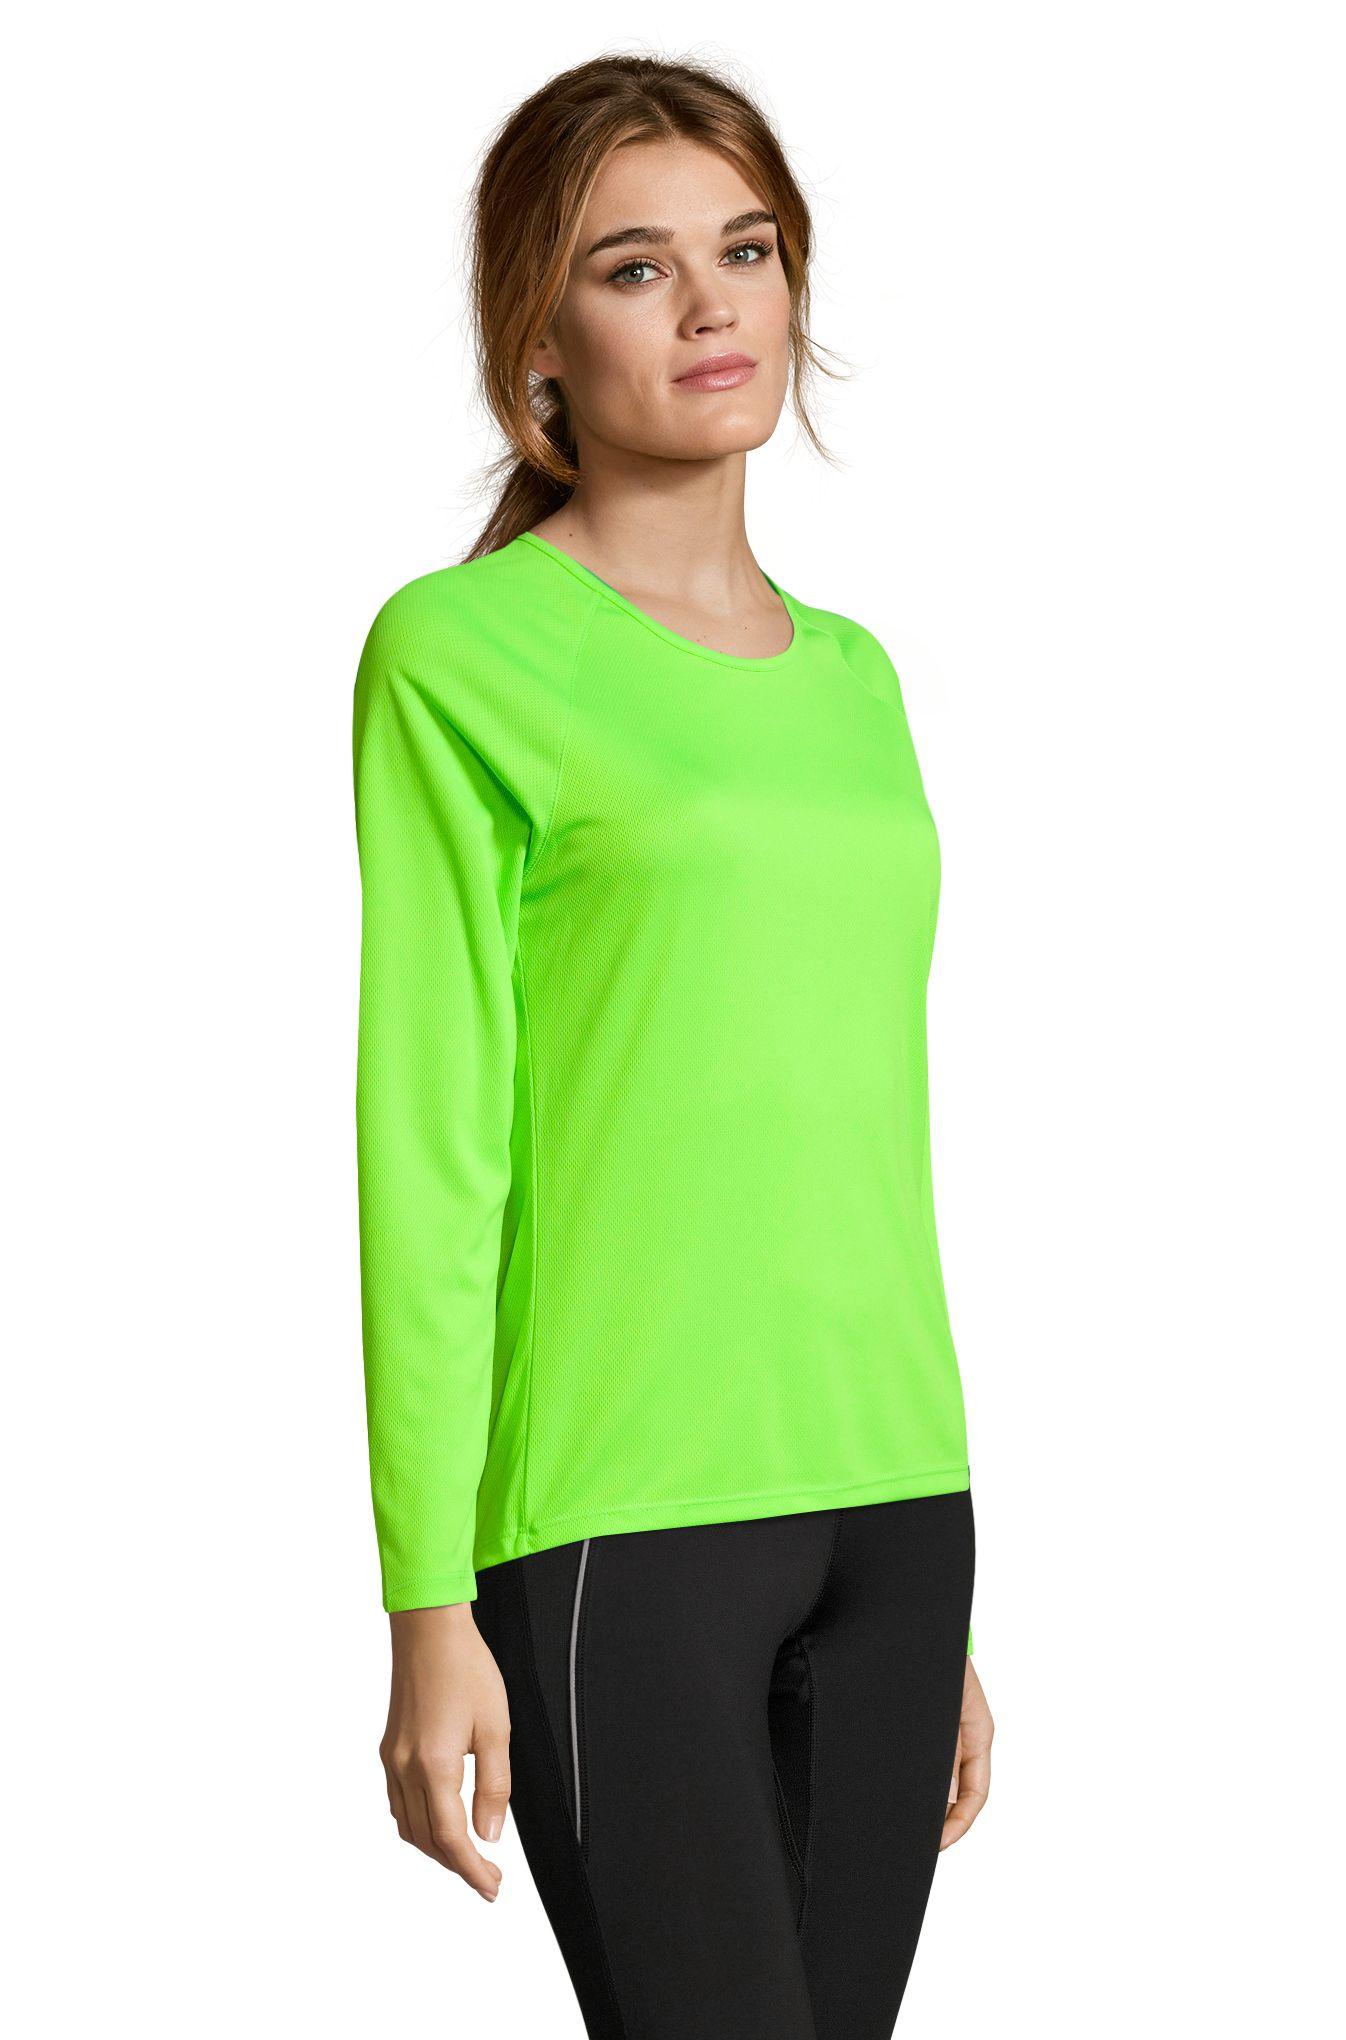 286 - Neon green